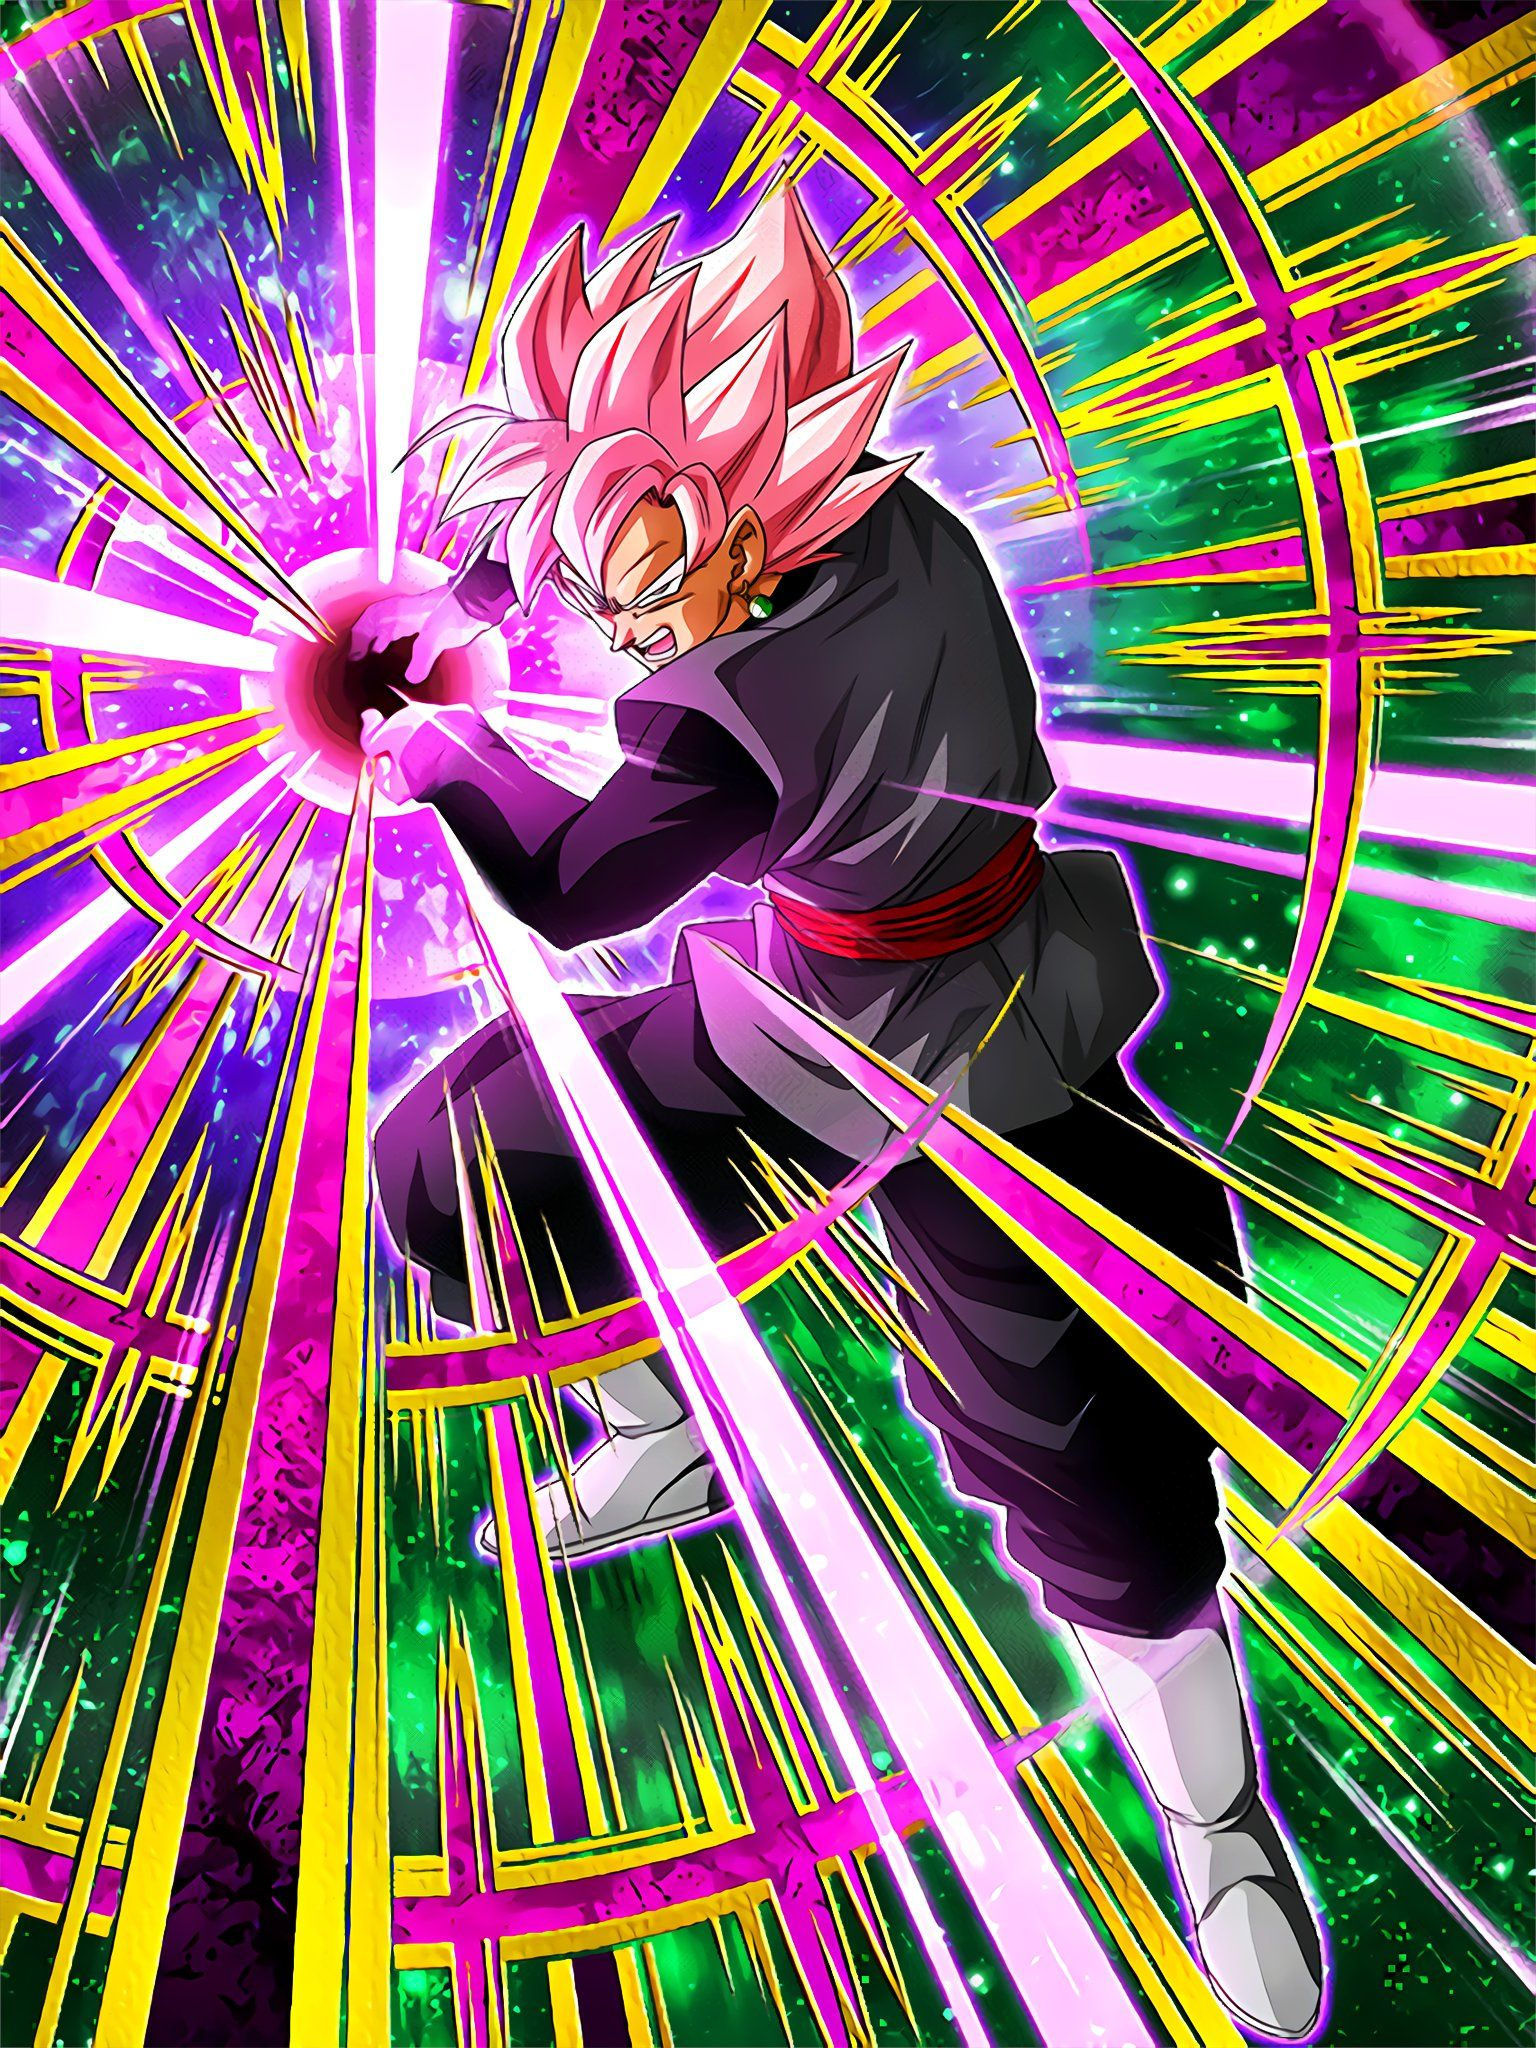 Hydros On Twitter Anime Dragon Ball Super Goku Black Anime Dragon Ball